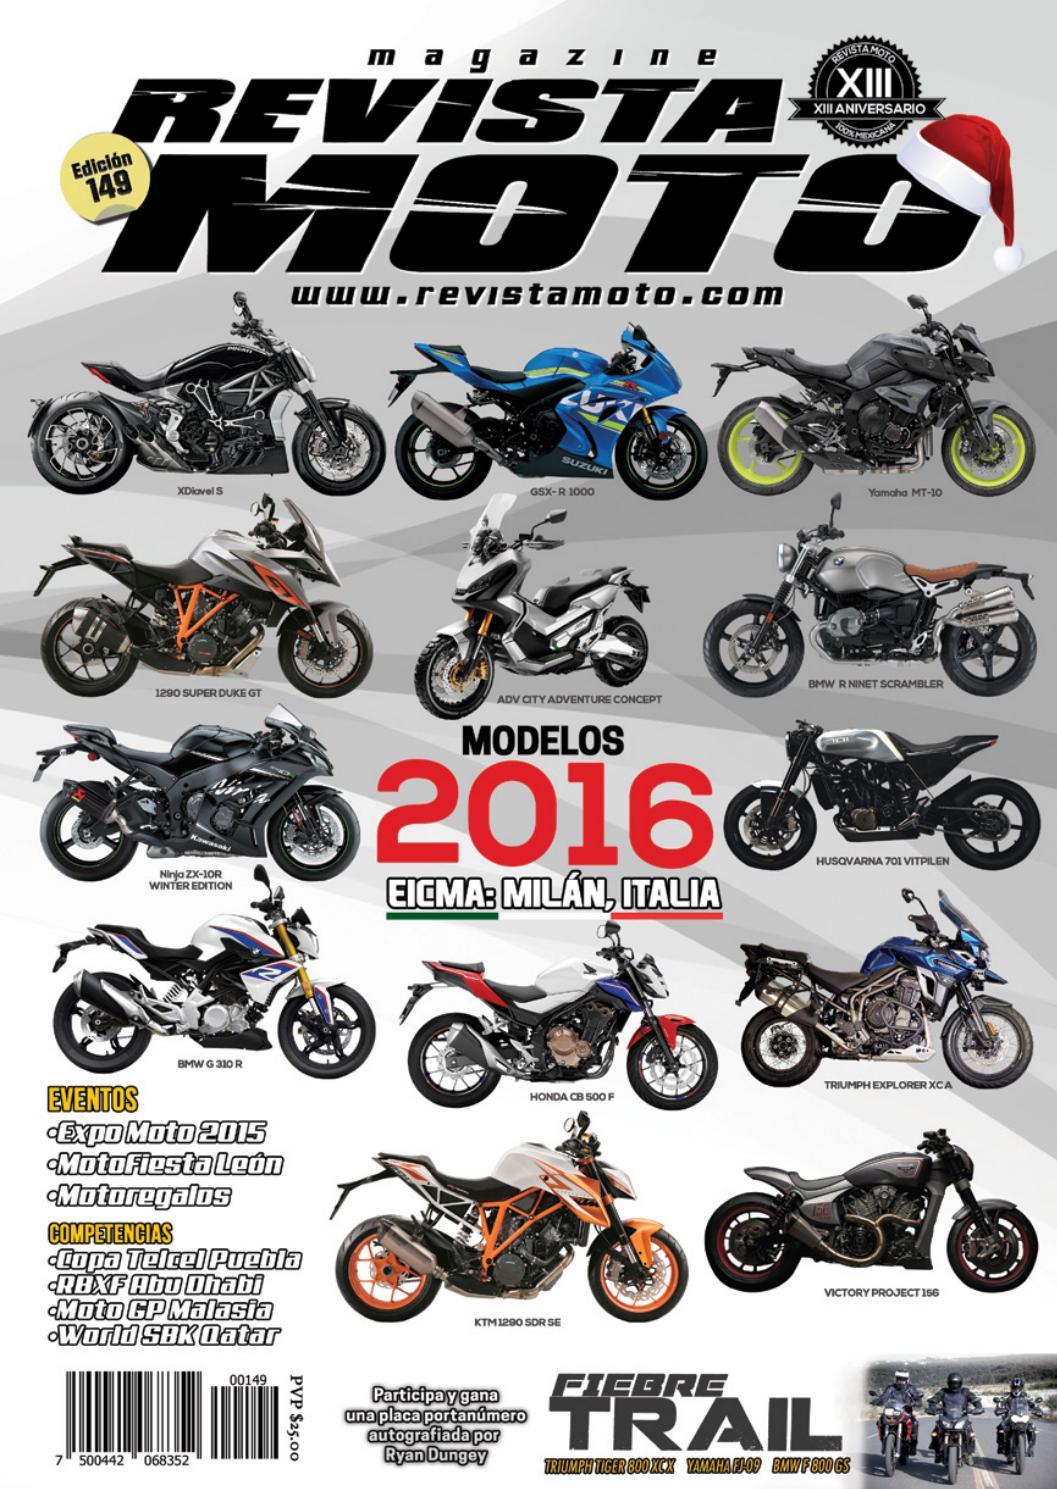 Fast Pro Moto Tanque de Gas tracci/ón protecci/ón Parte Pad Fuel Rodilleras para Kawasaki Z800/Z 800/2012/ /2014